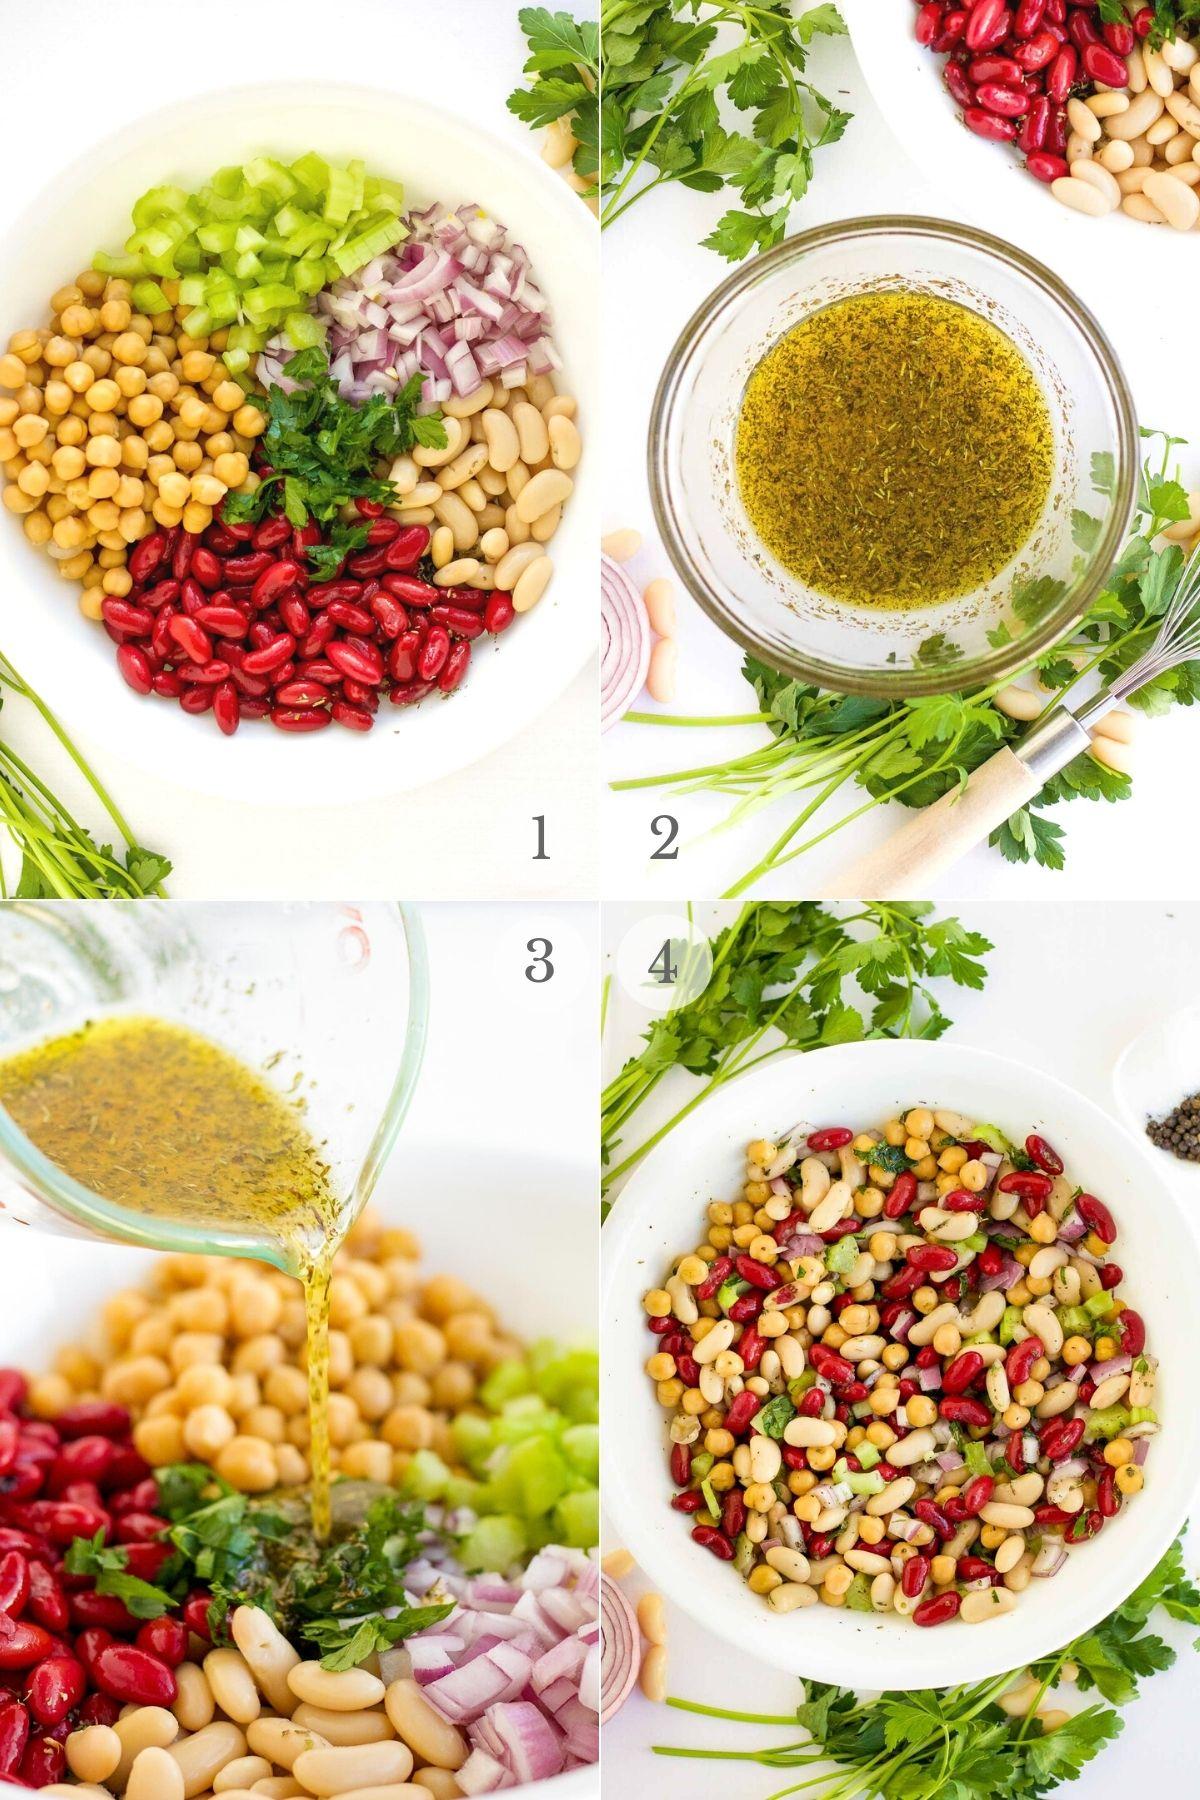 three bean salad recipe steps 1-4